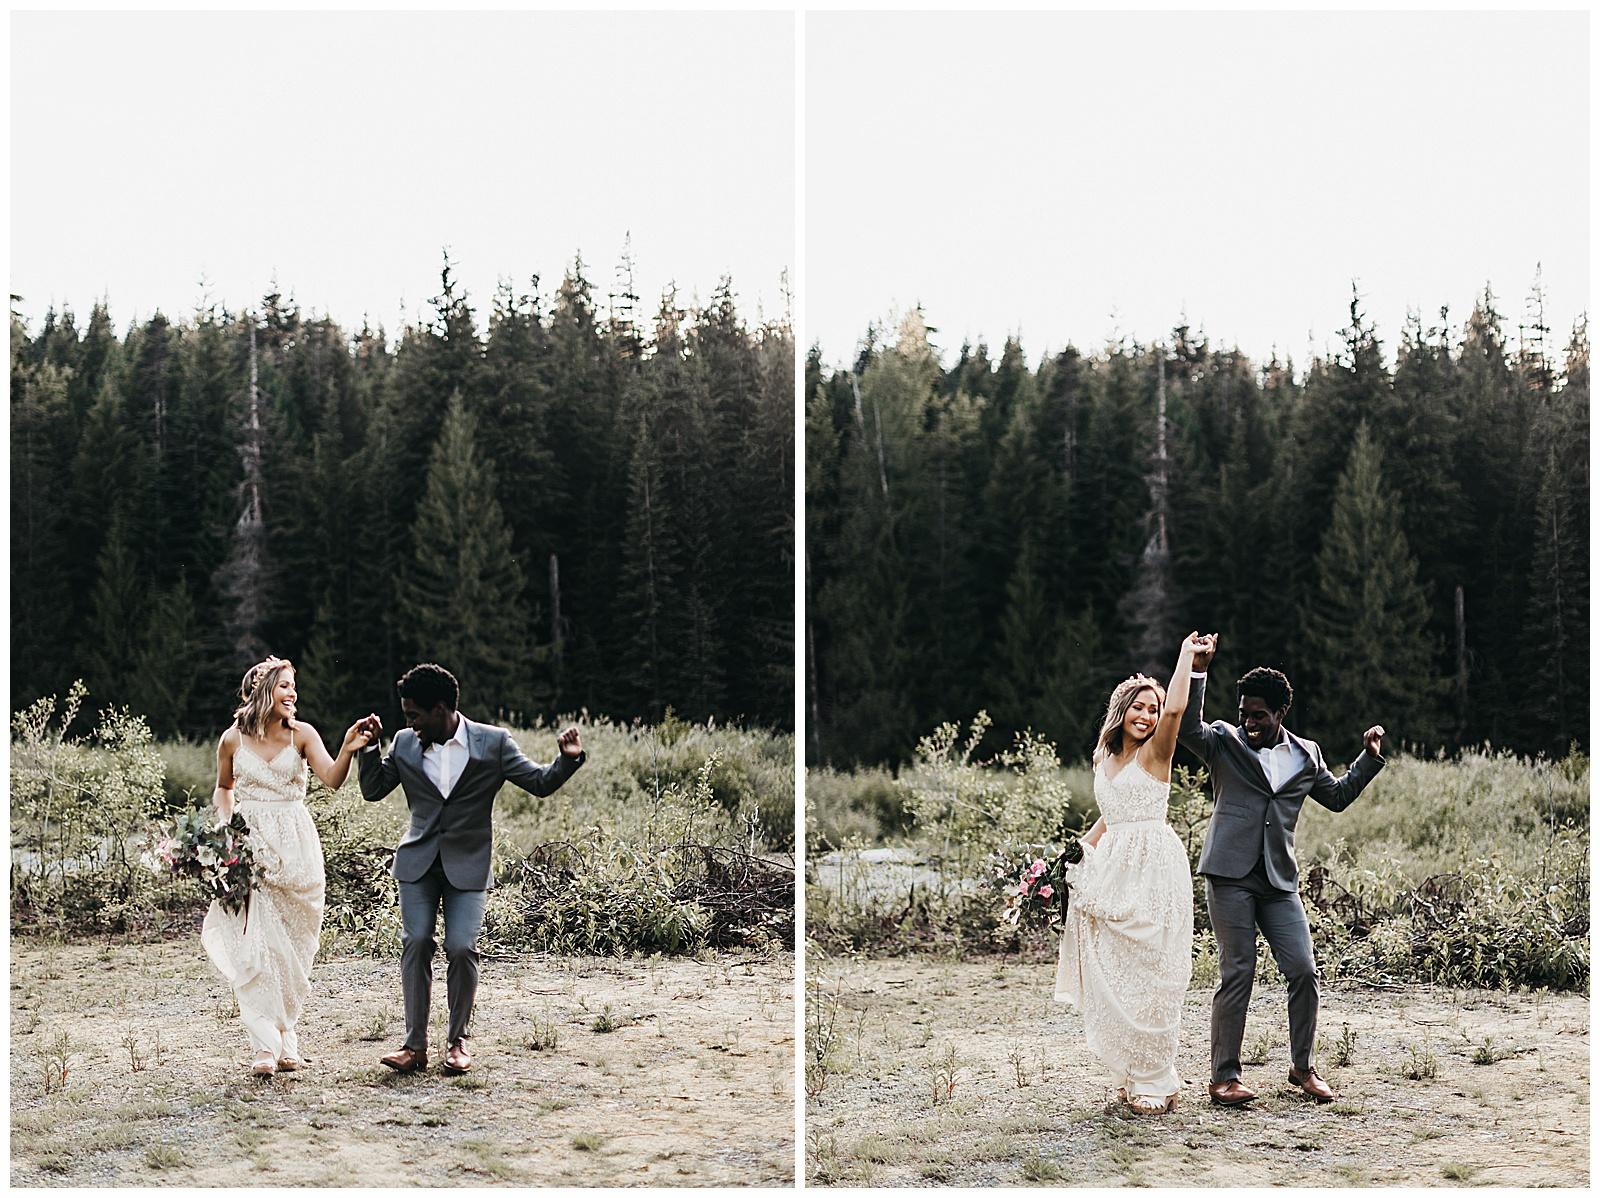 seattle-wedding-photographer-seattle-elopement-photographer-anniezav_0015.jpg